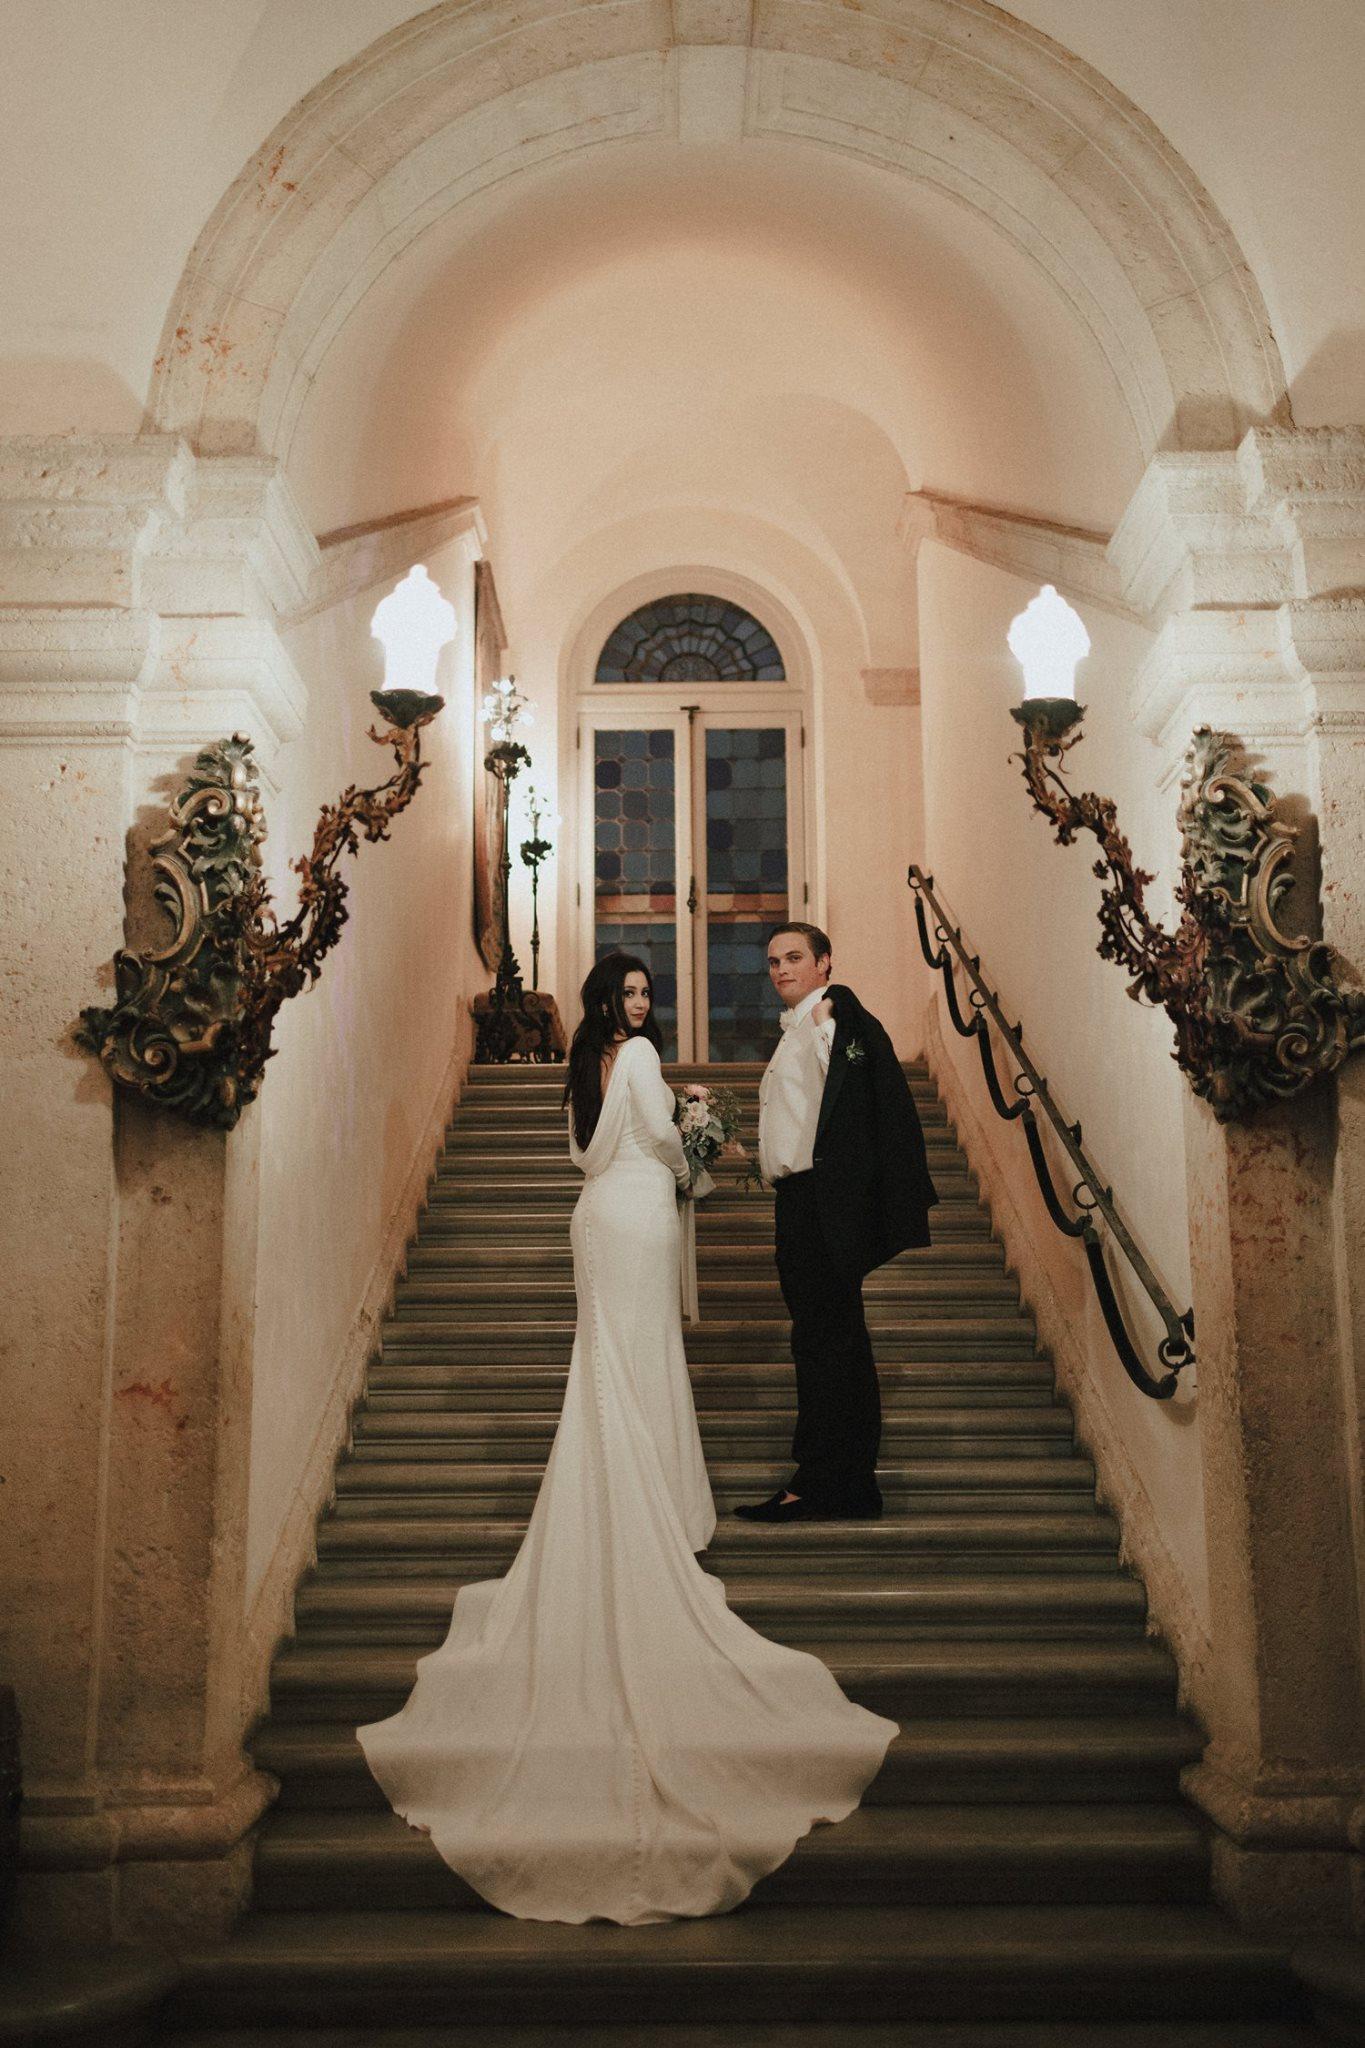 Catering Luxury Destination Wedding in Miami 8.jpg